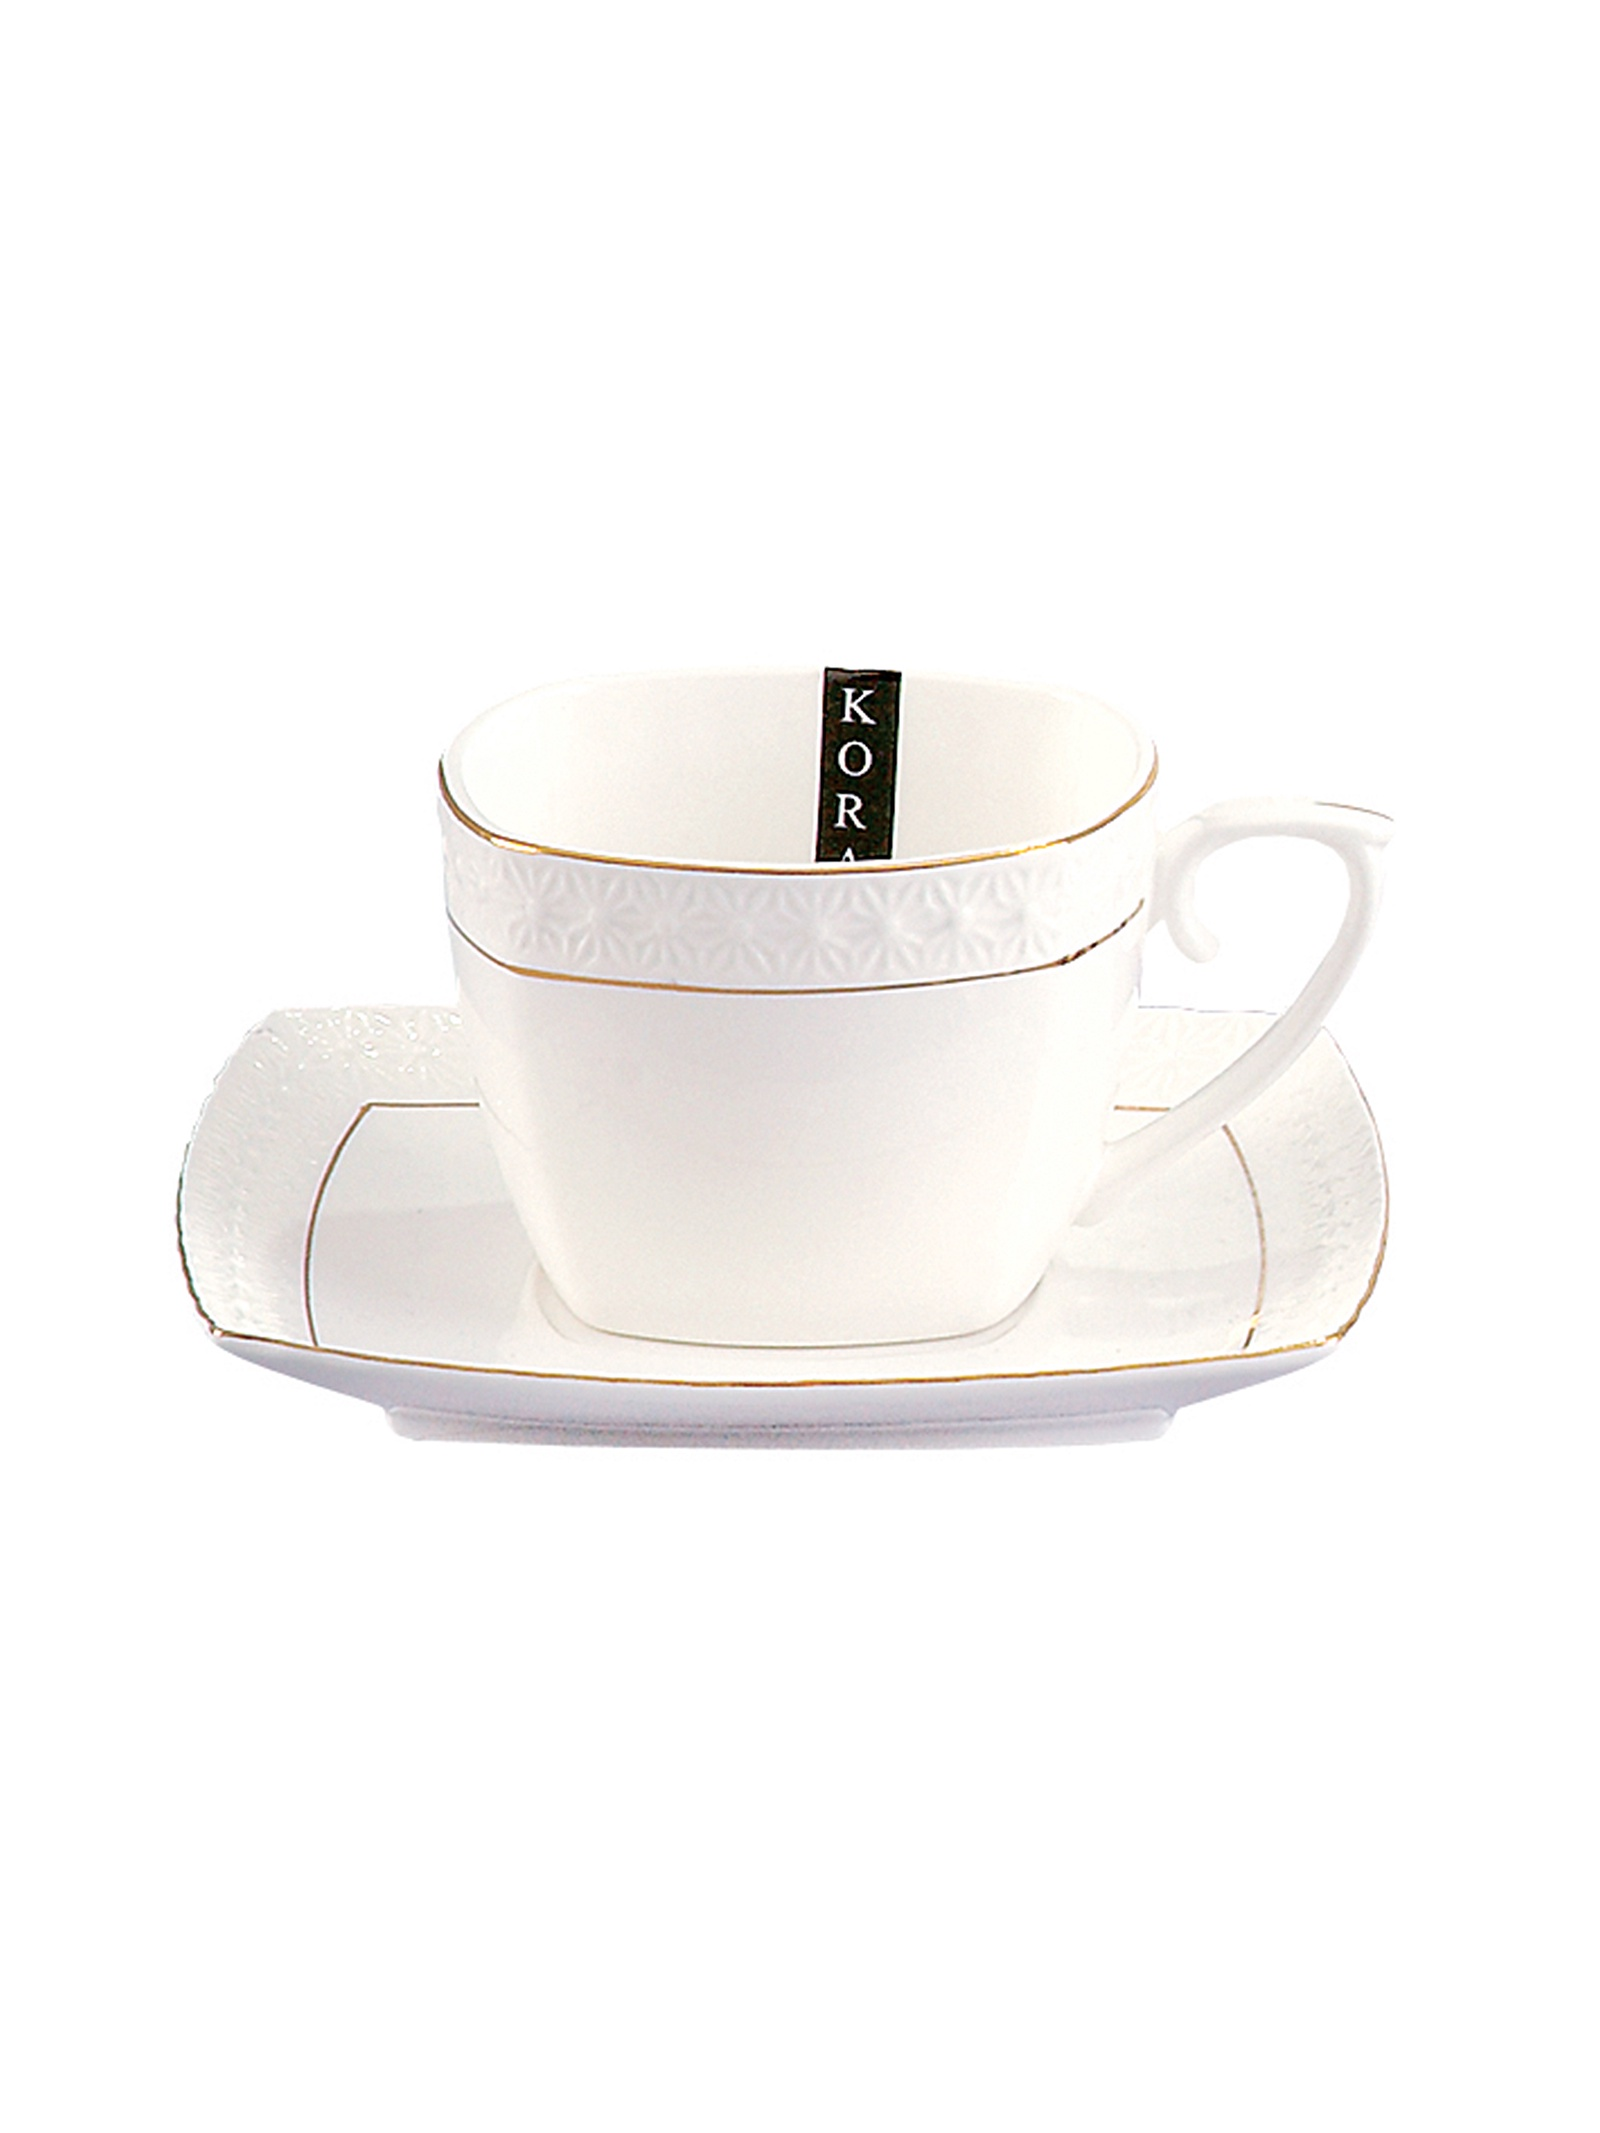 Чайная пара Коралл 749200, Керамика чайная пара 240 мл 6 шт sykora